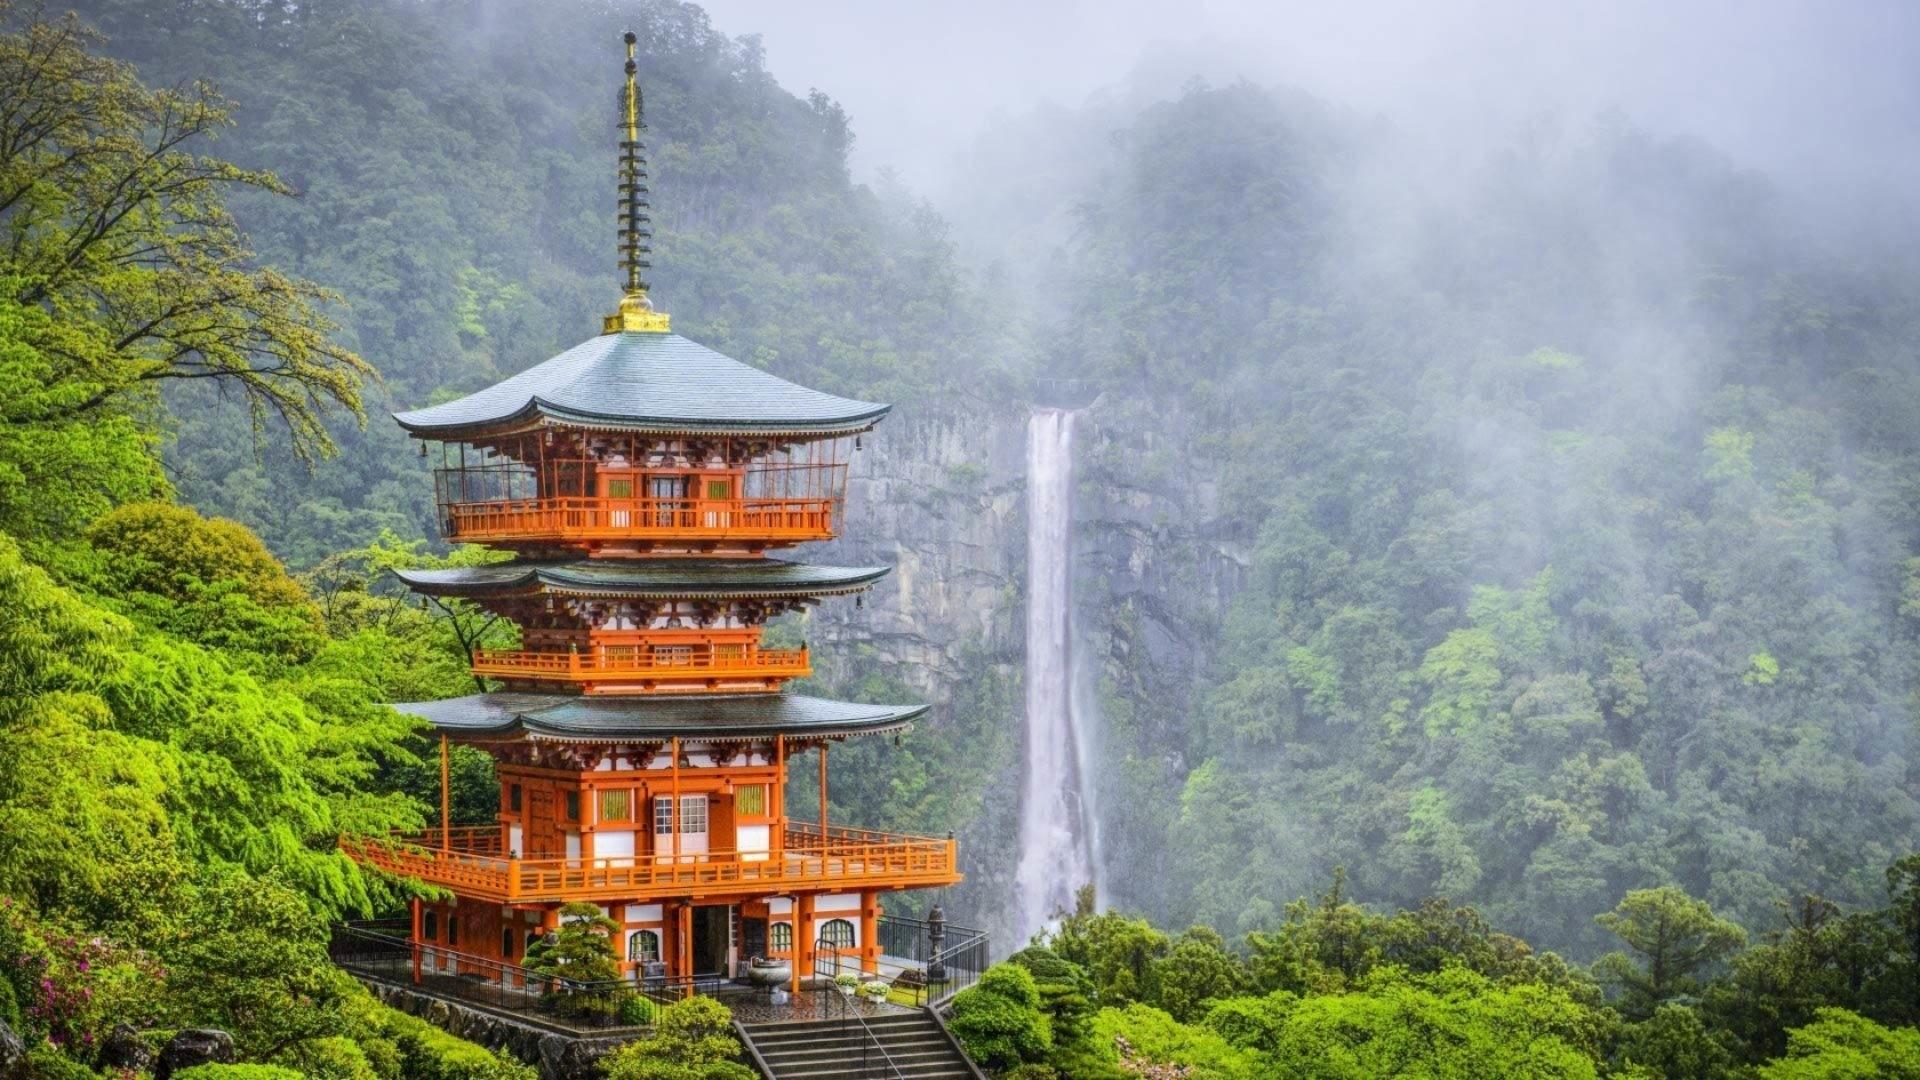 Japan Wallpaper Free Download